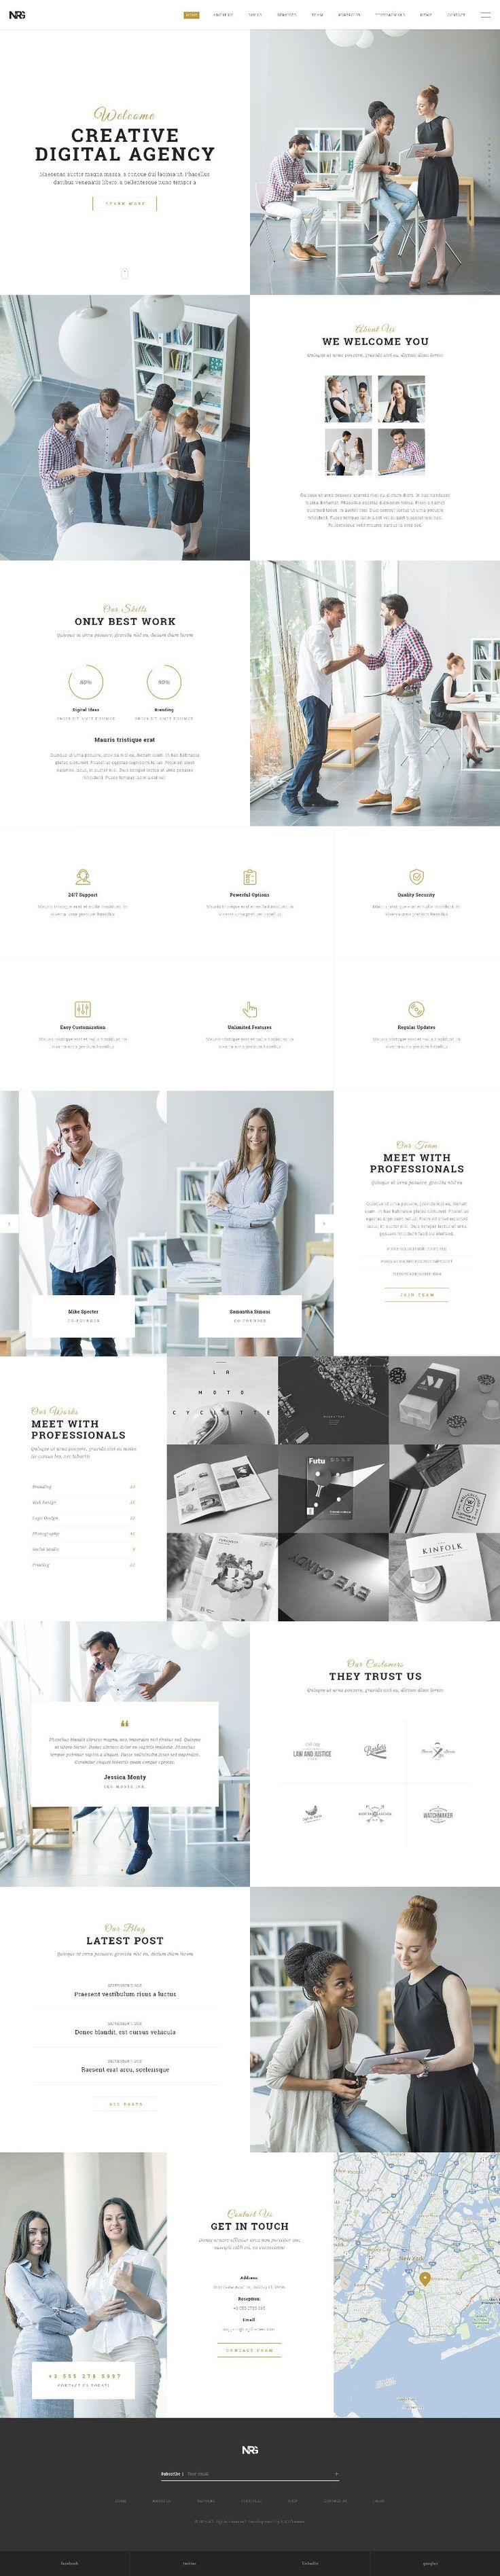 Web Design Inspiration from NRG 2